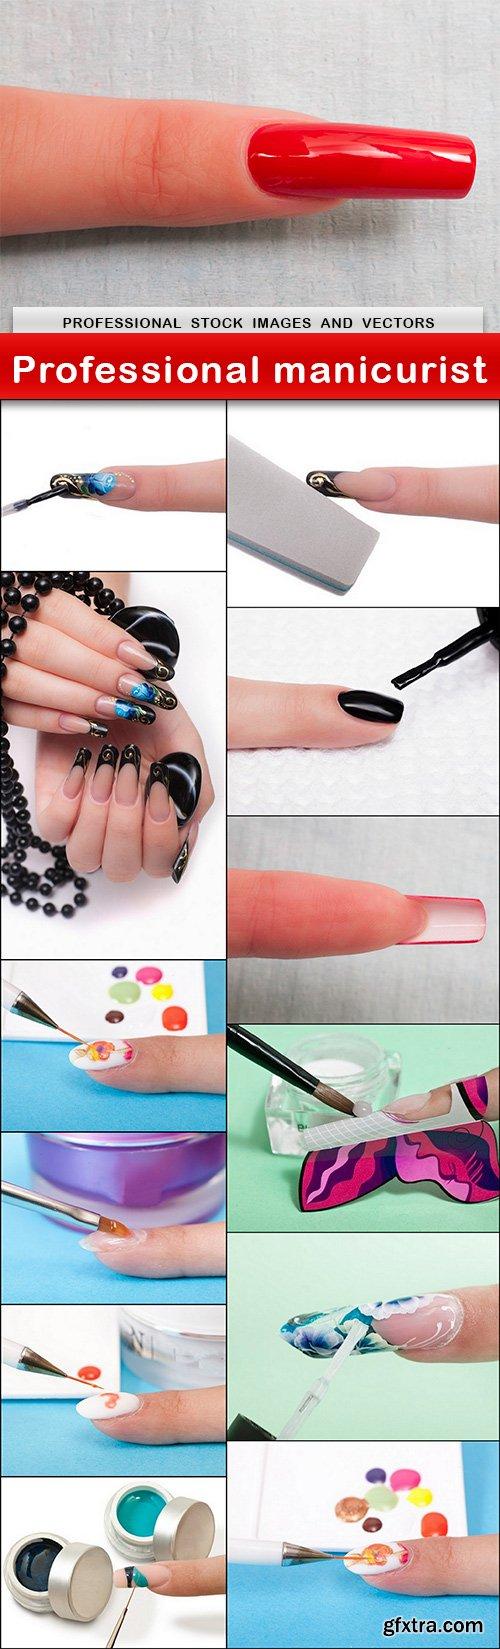 Professional manicurist - 13 UHQ JPEG